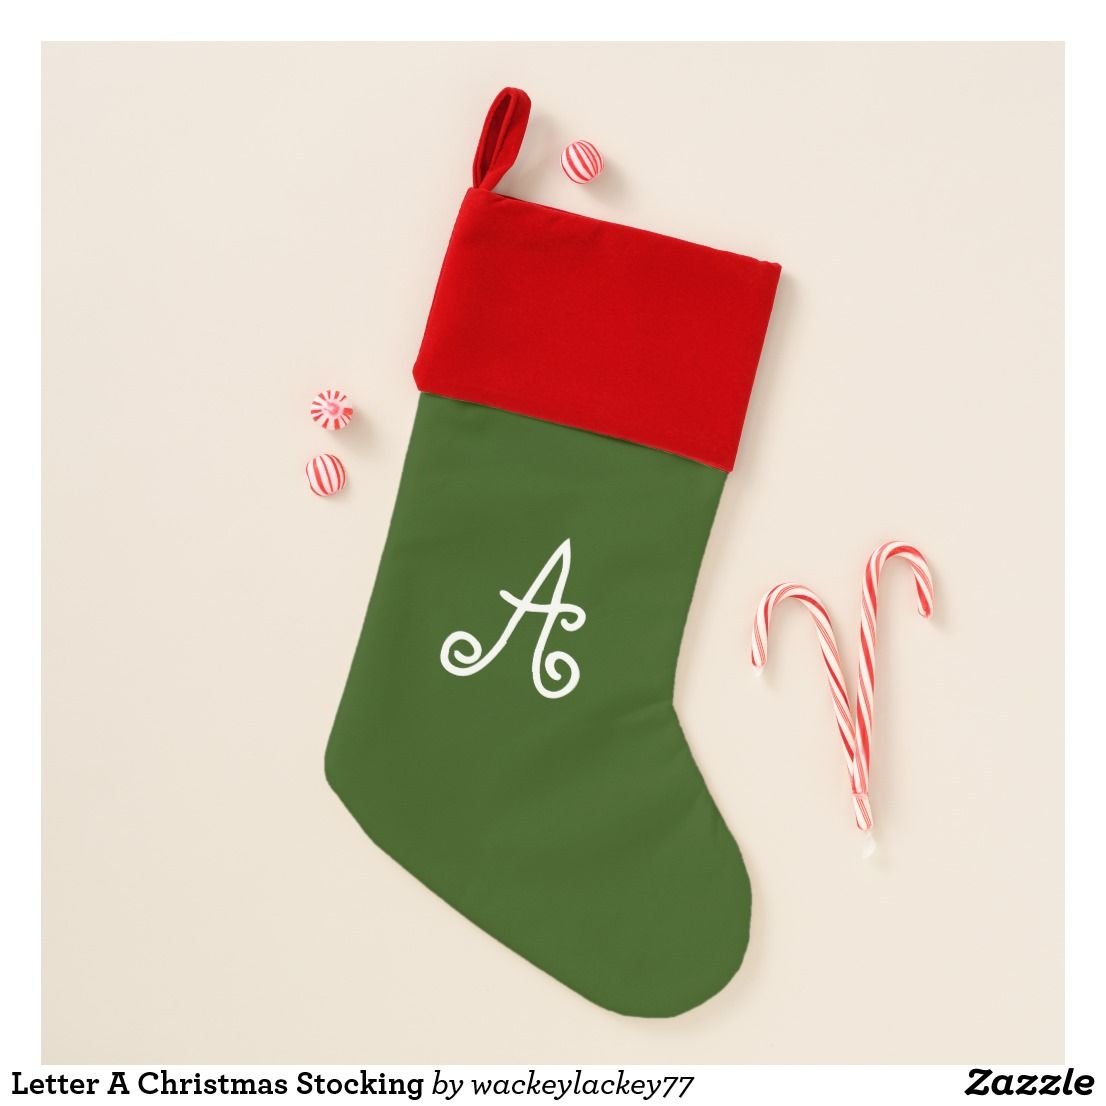 Letter Christmas Stockings.Letter A Christmas Stocking Zazzle Com Christmas Stockings